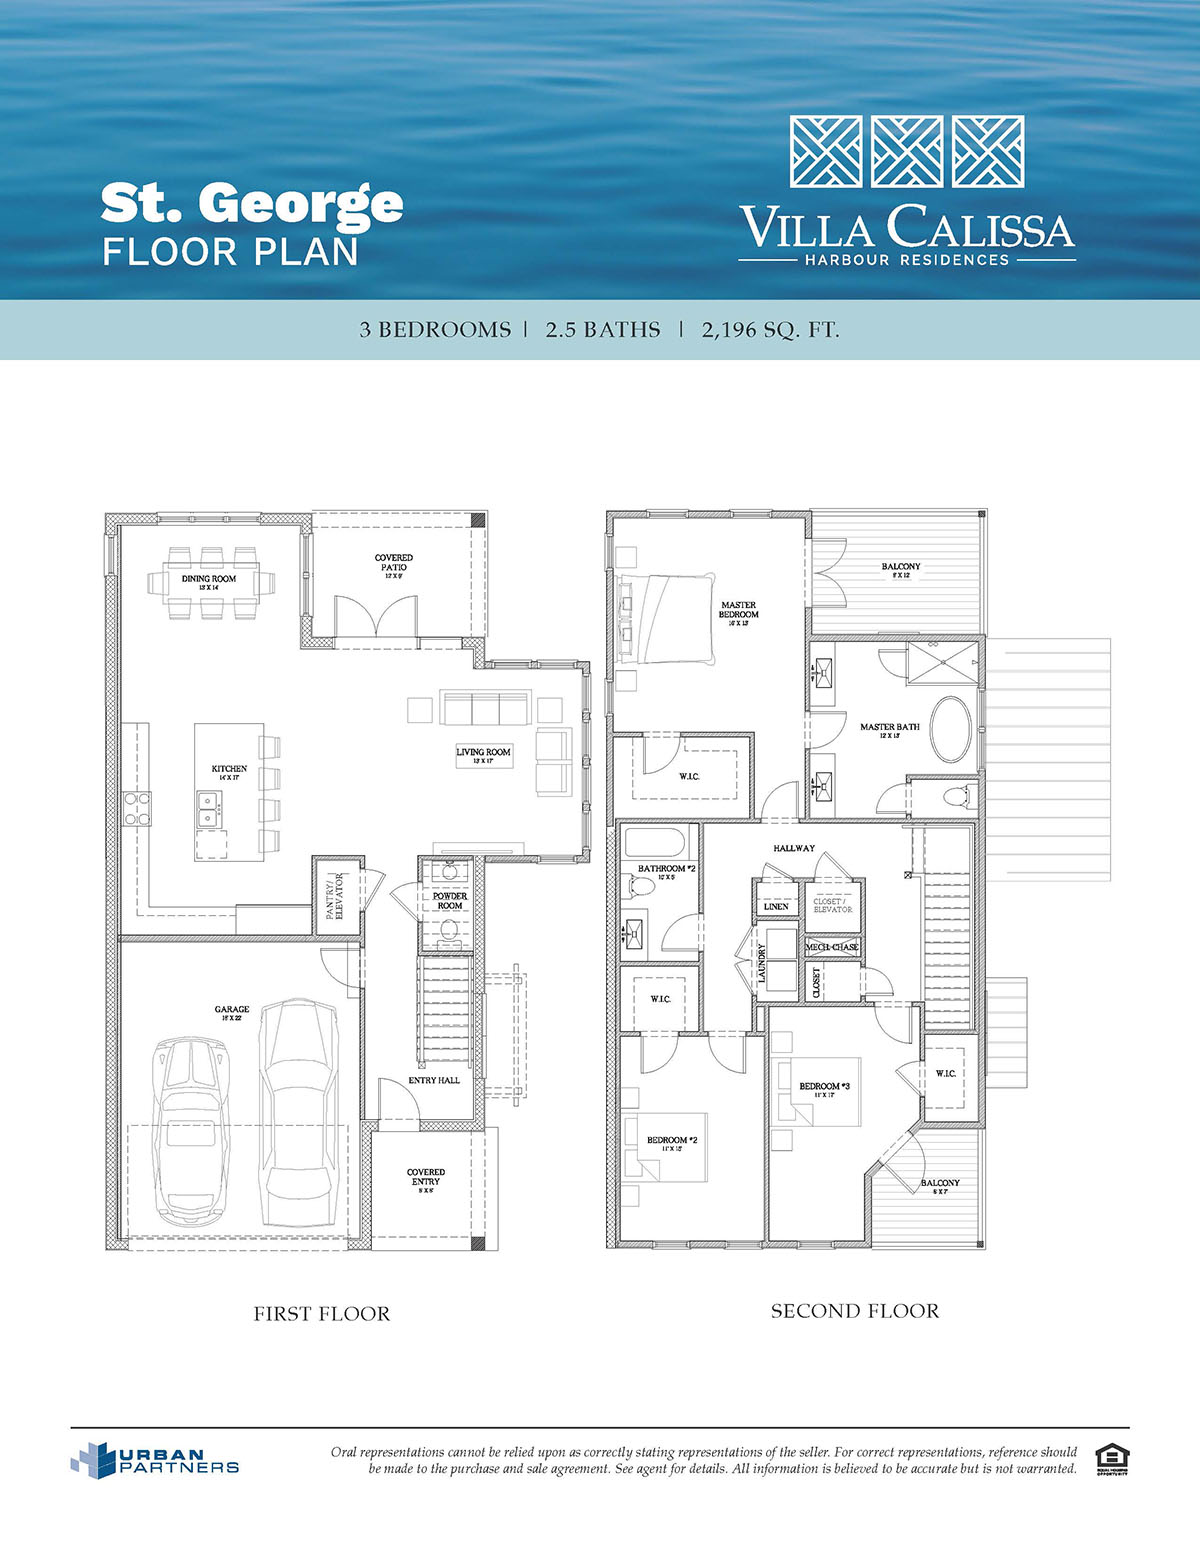 St. George floor plan at Villa Calissa